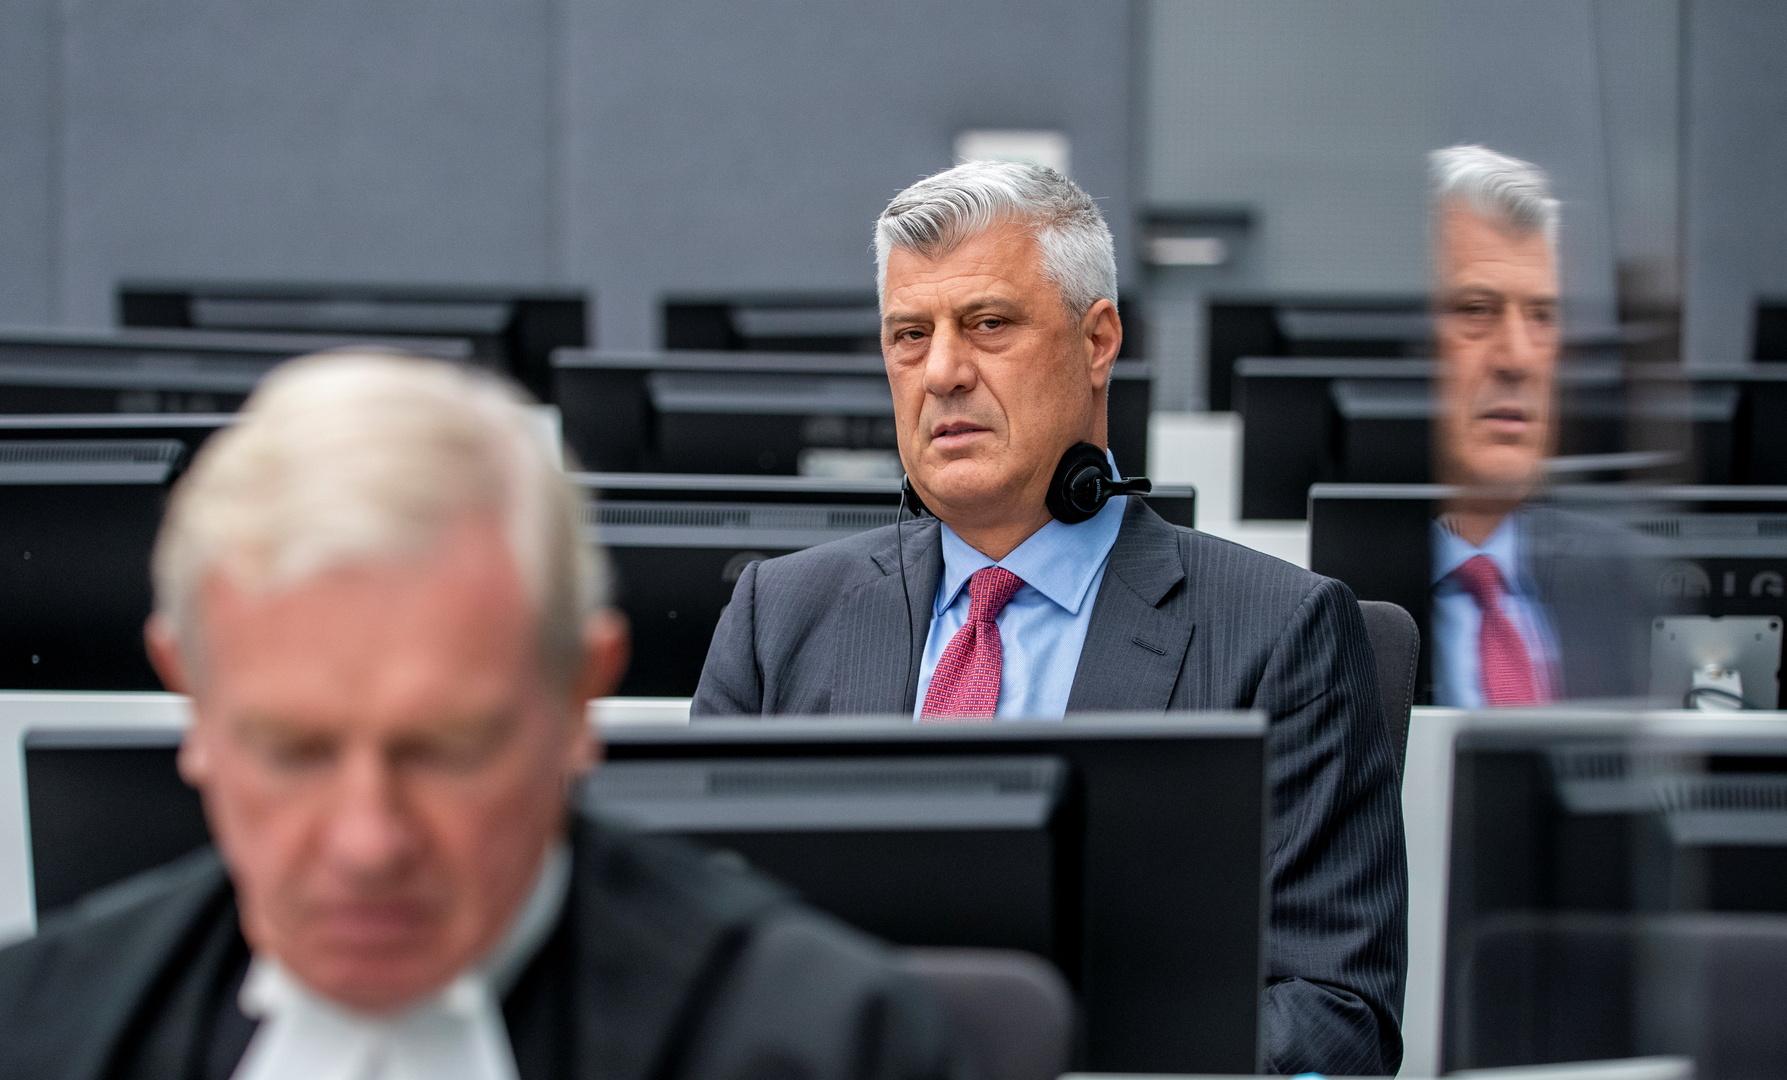 رئيس كوسوفو السابق هاشم ثاتشي